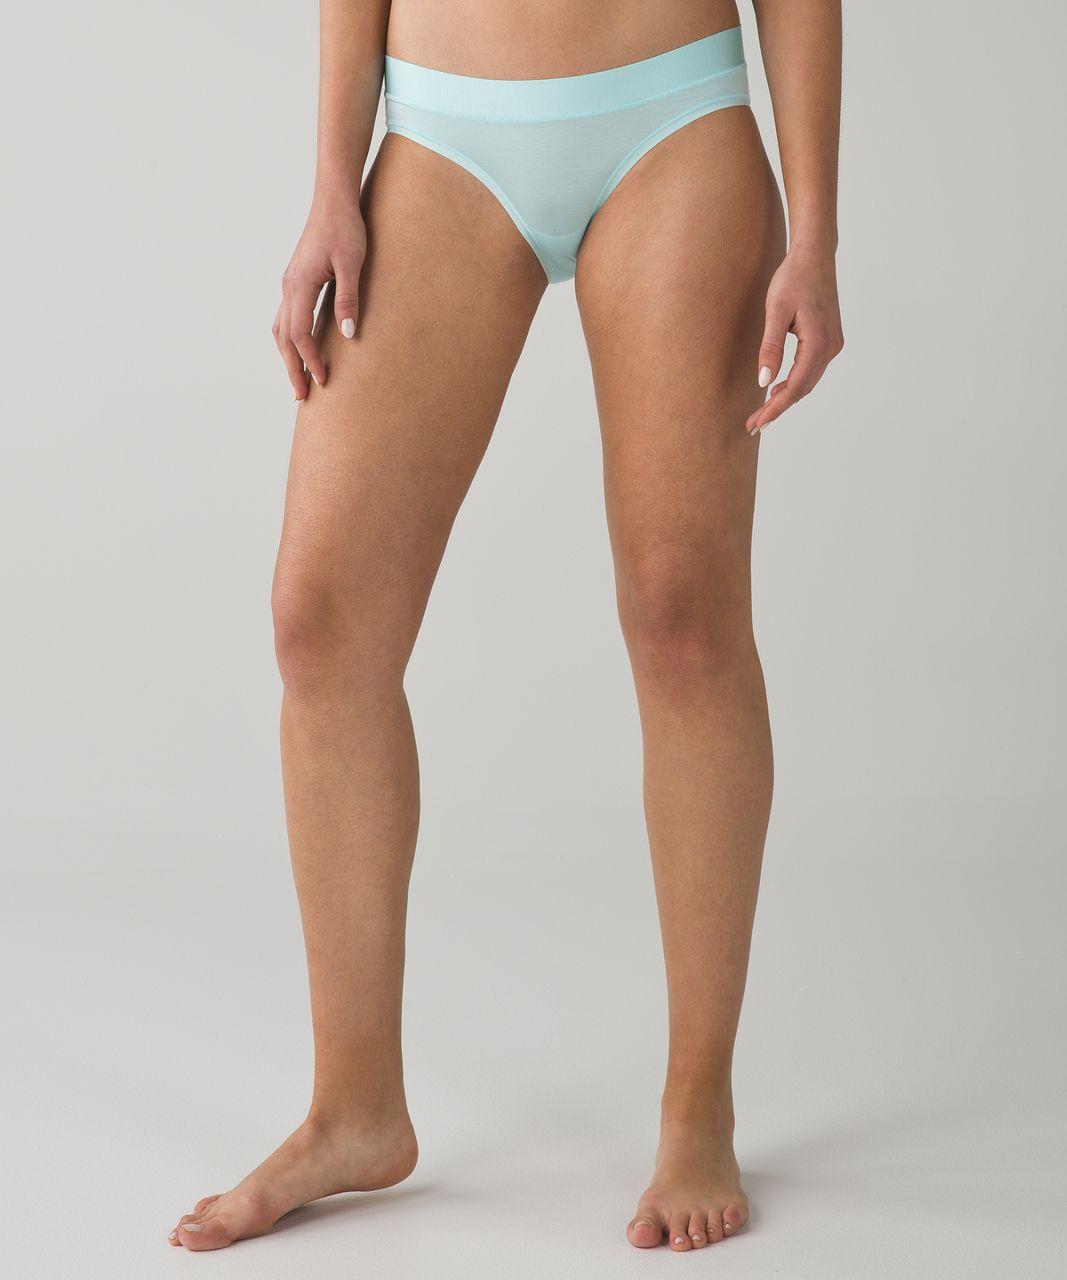 Lululemon Mula Bandhawear Bikini - Aquamarine